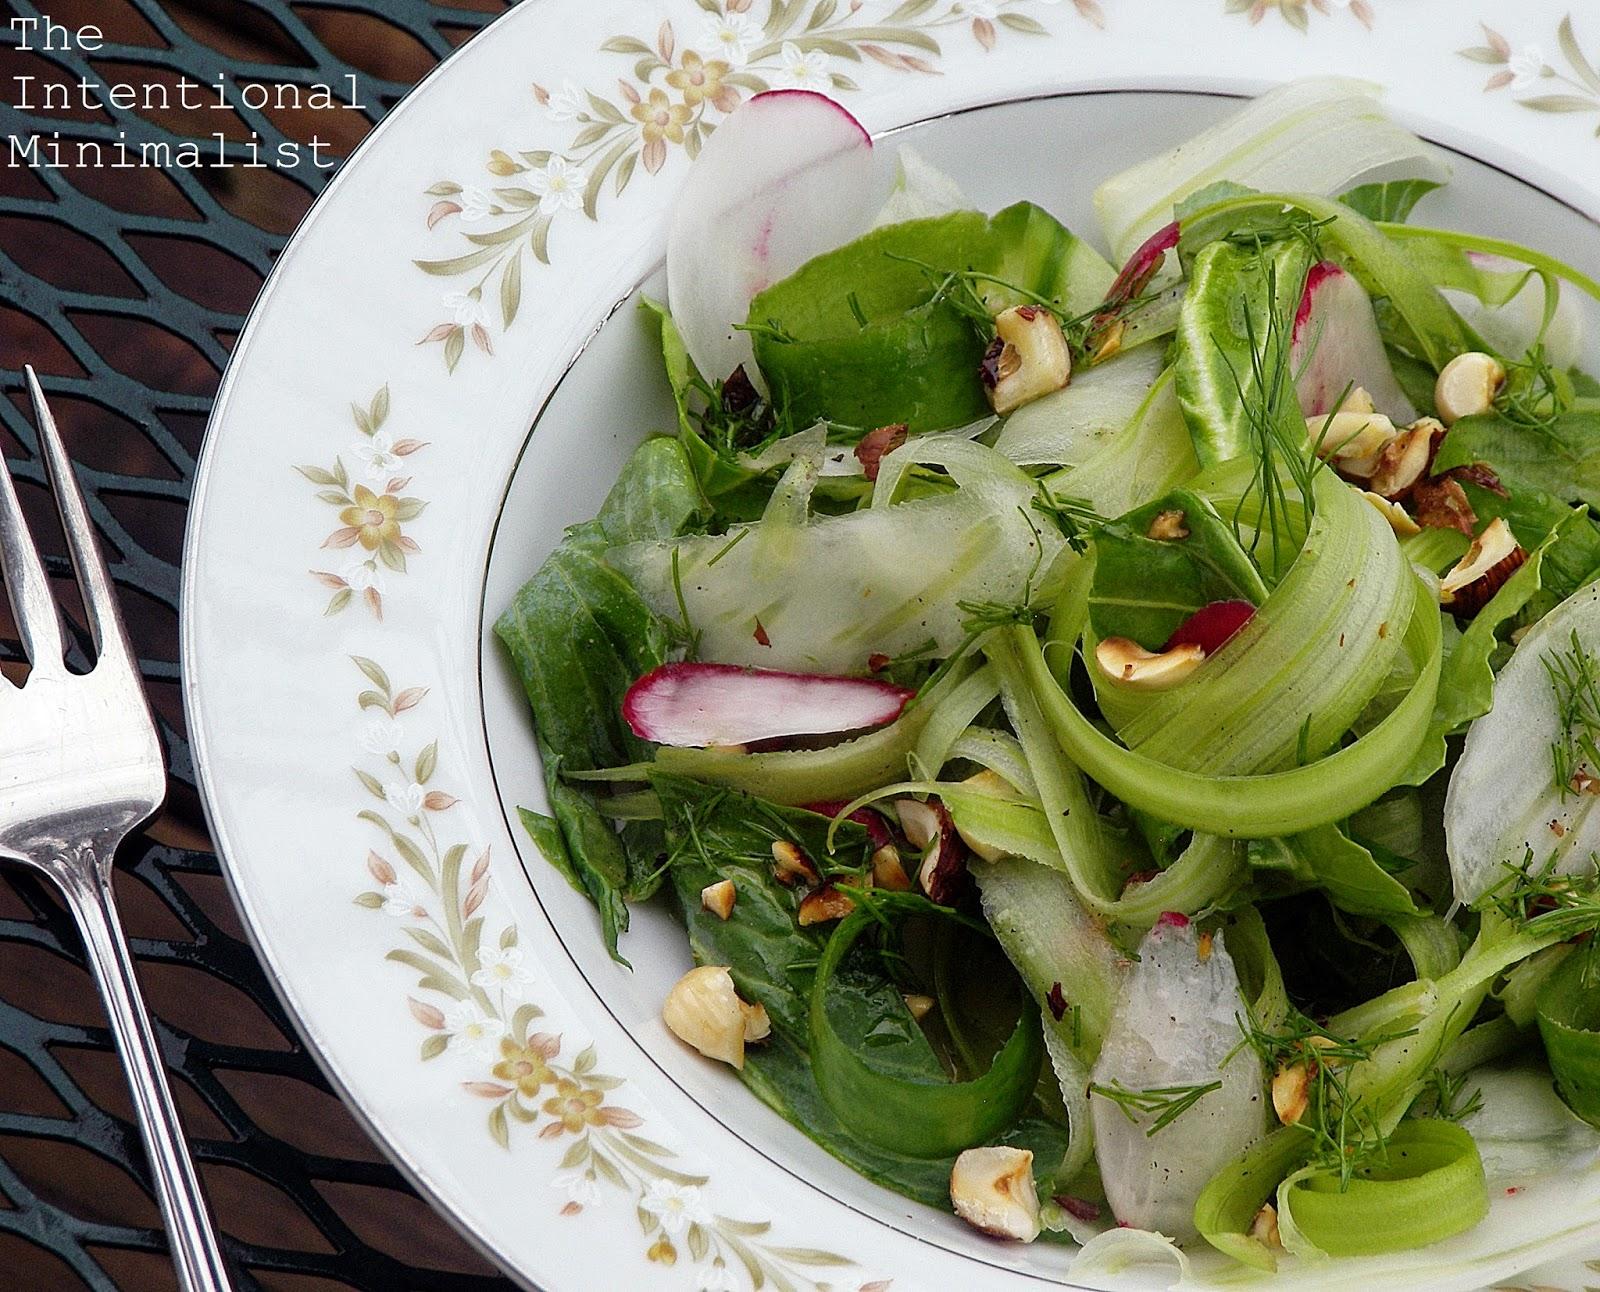 ... +Fennel+and+White+Swiss+Chard+Salad+with+Hazelnut+Fennel+Dressing.JPG